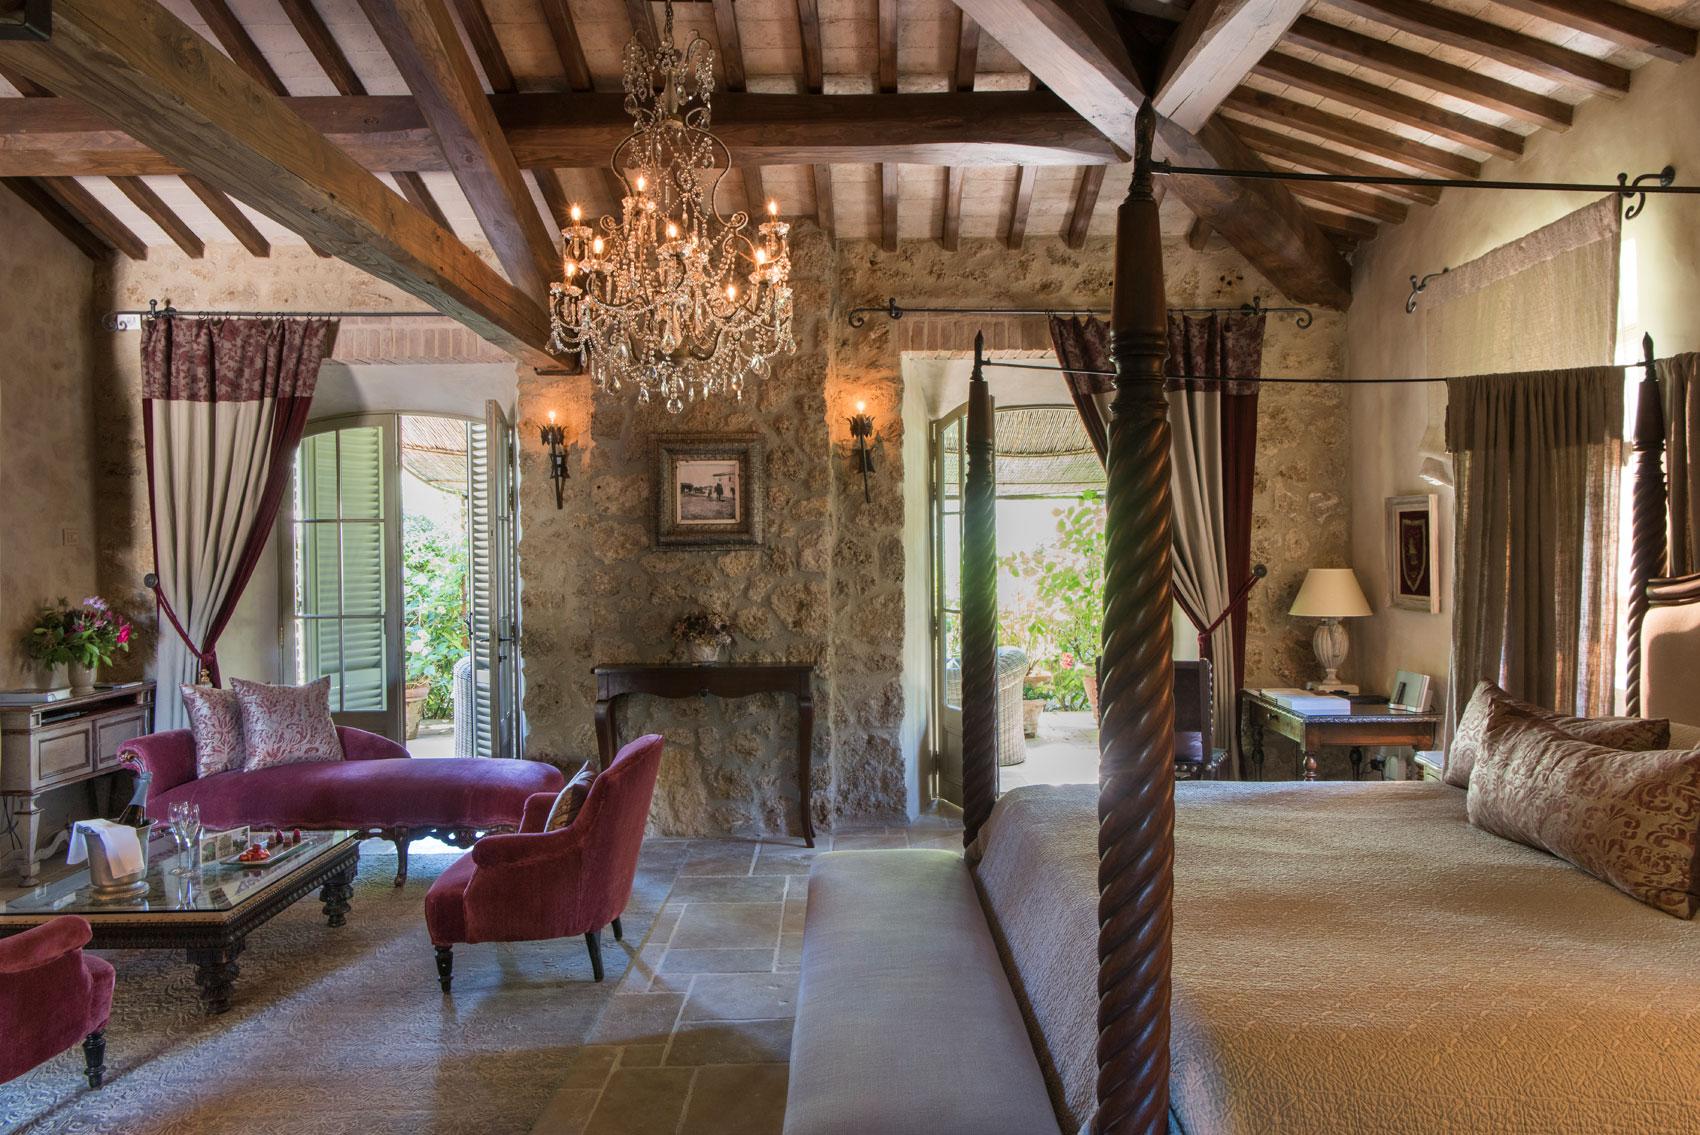 Maggiorana garden suite of Borgo Santo Pietro